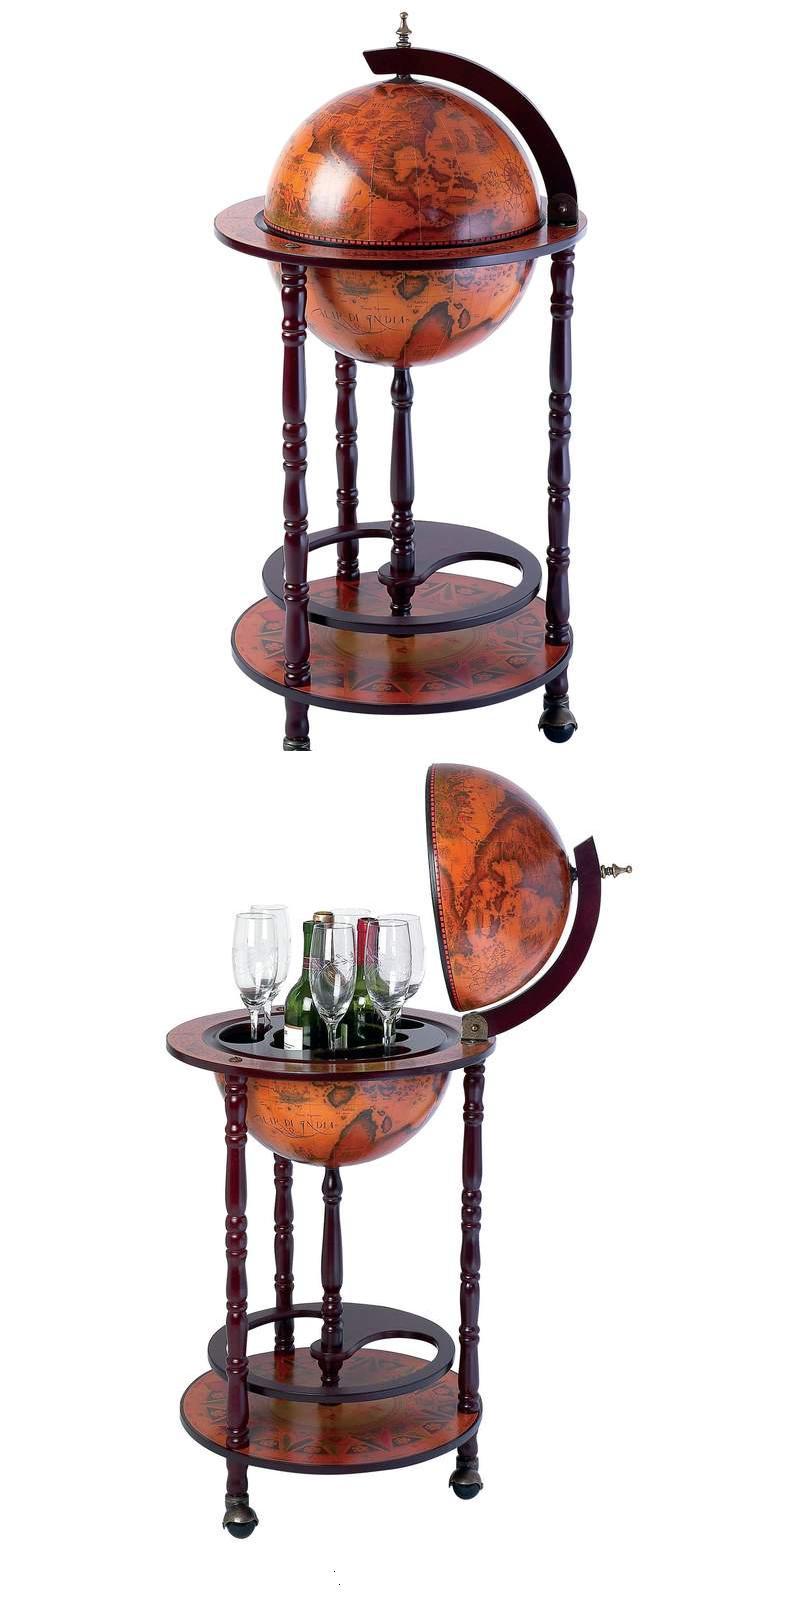 "17 1/2"" Diameter Wine Globes (HHGLB32)"